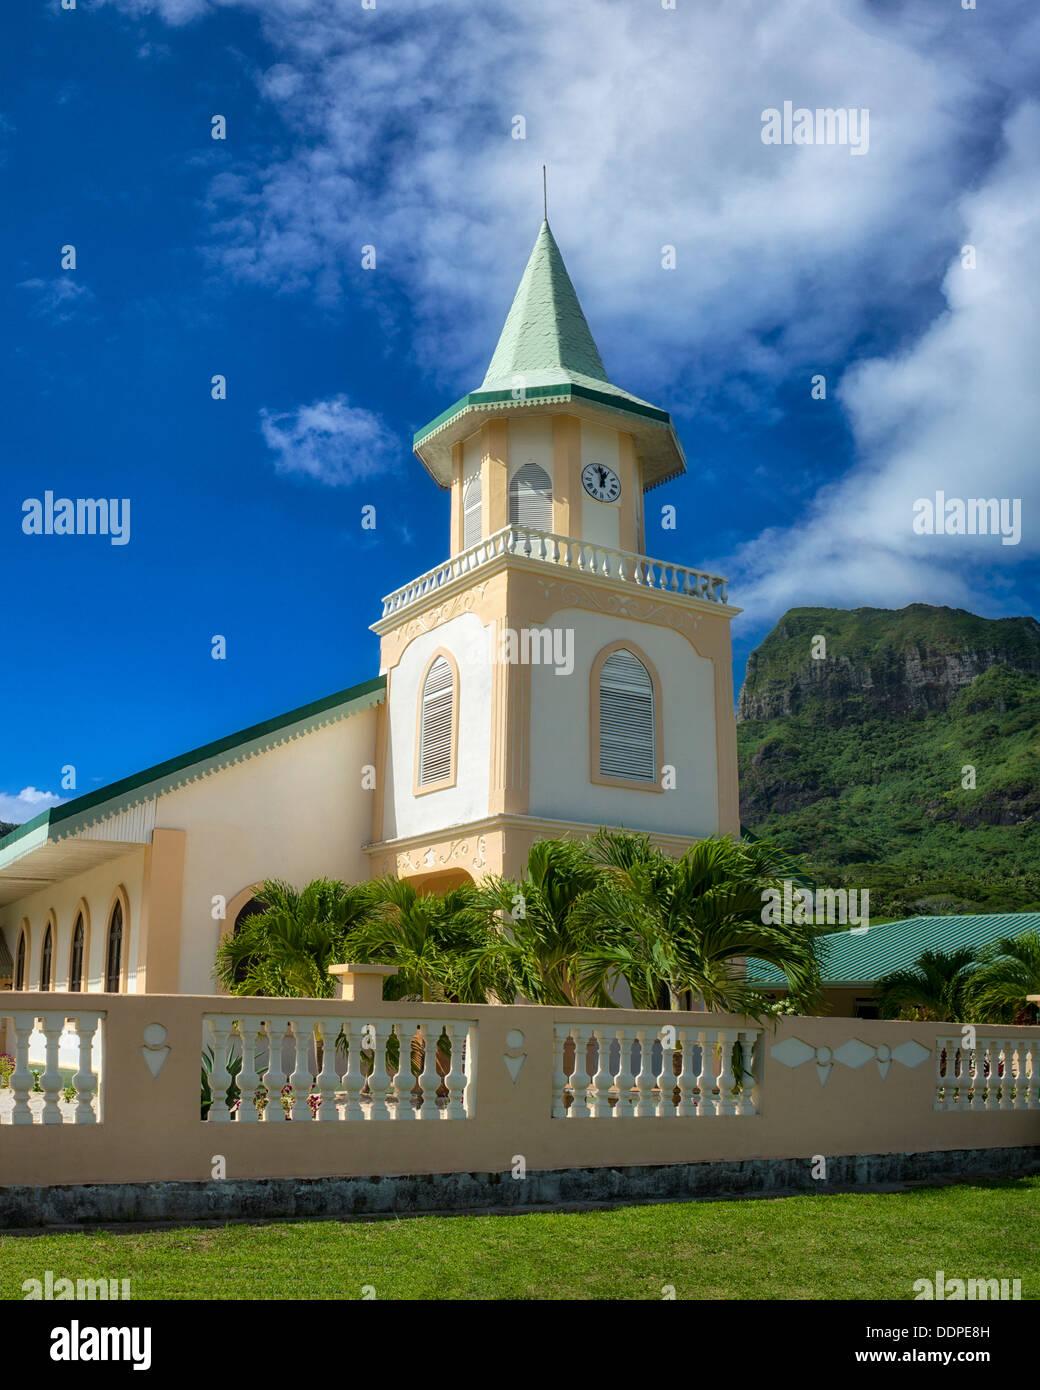 Faanui Protestant Church. Bora Bora. French Polynesia. - Stock Image